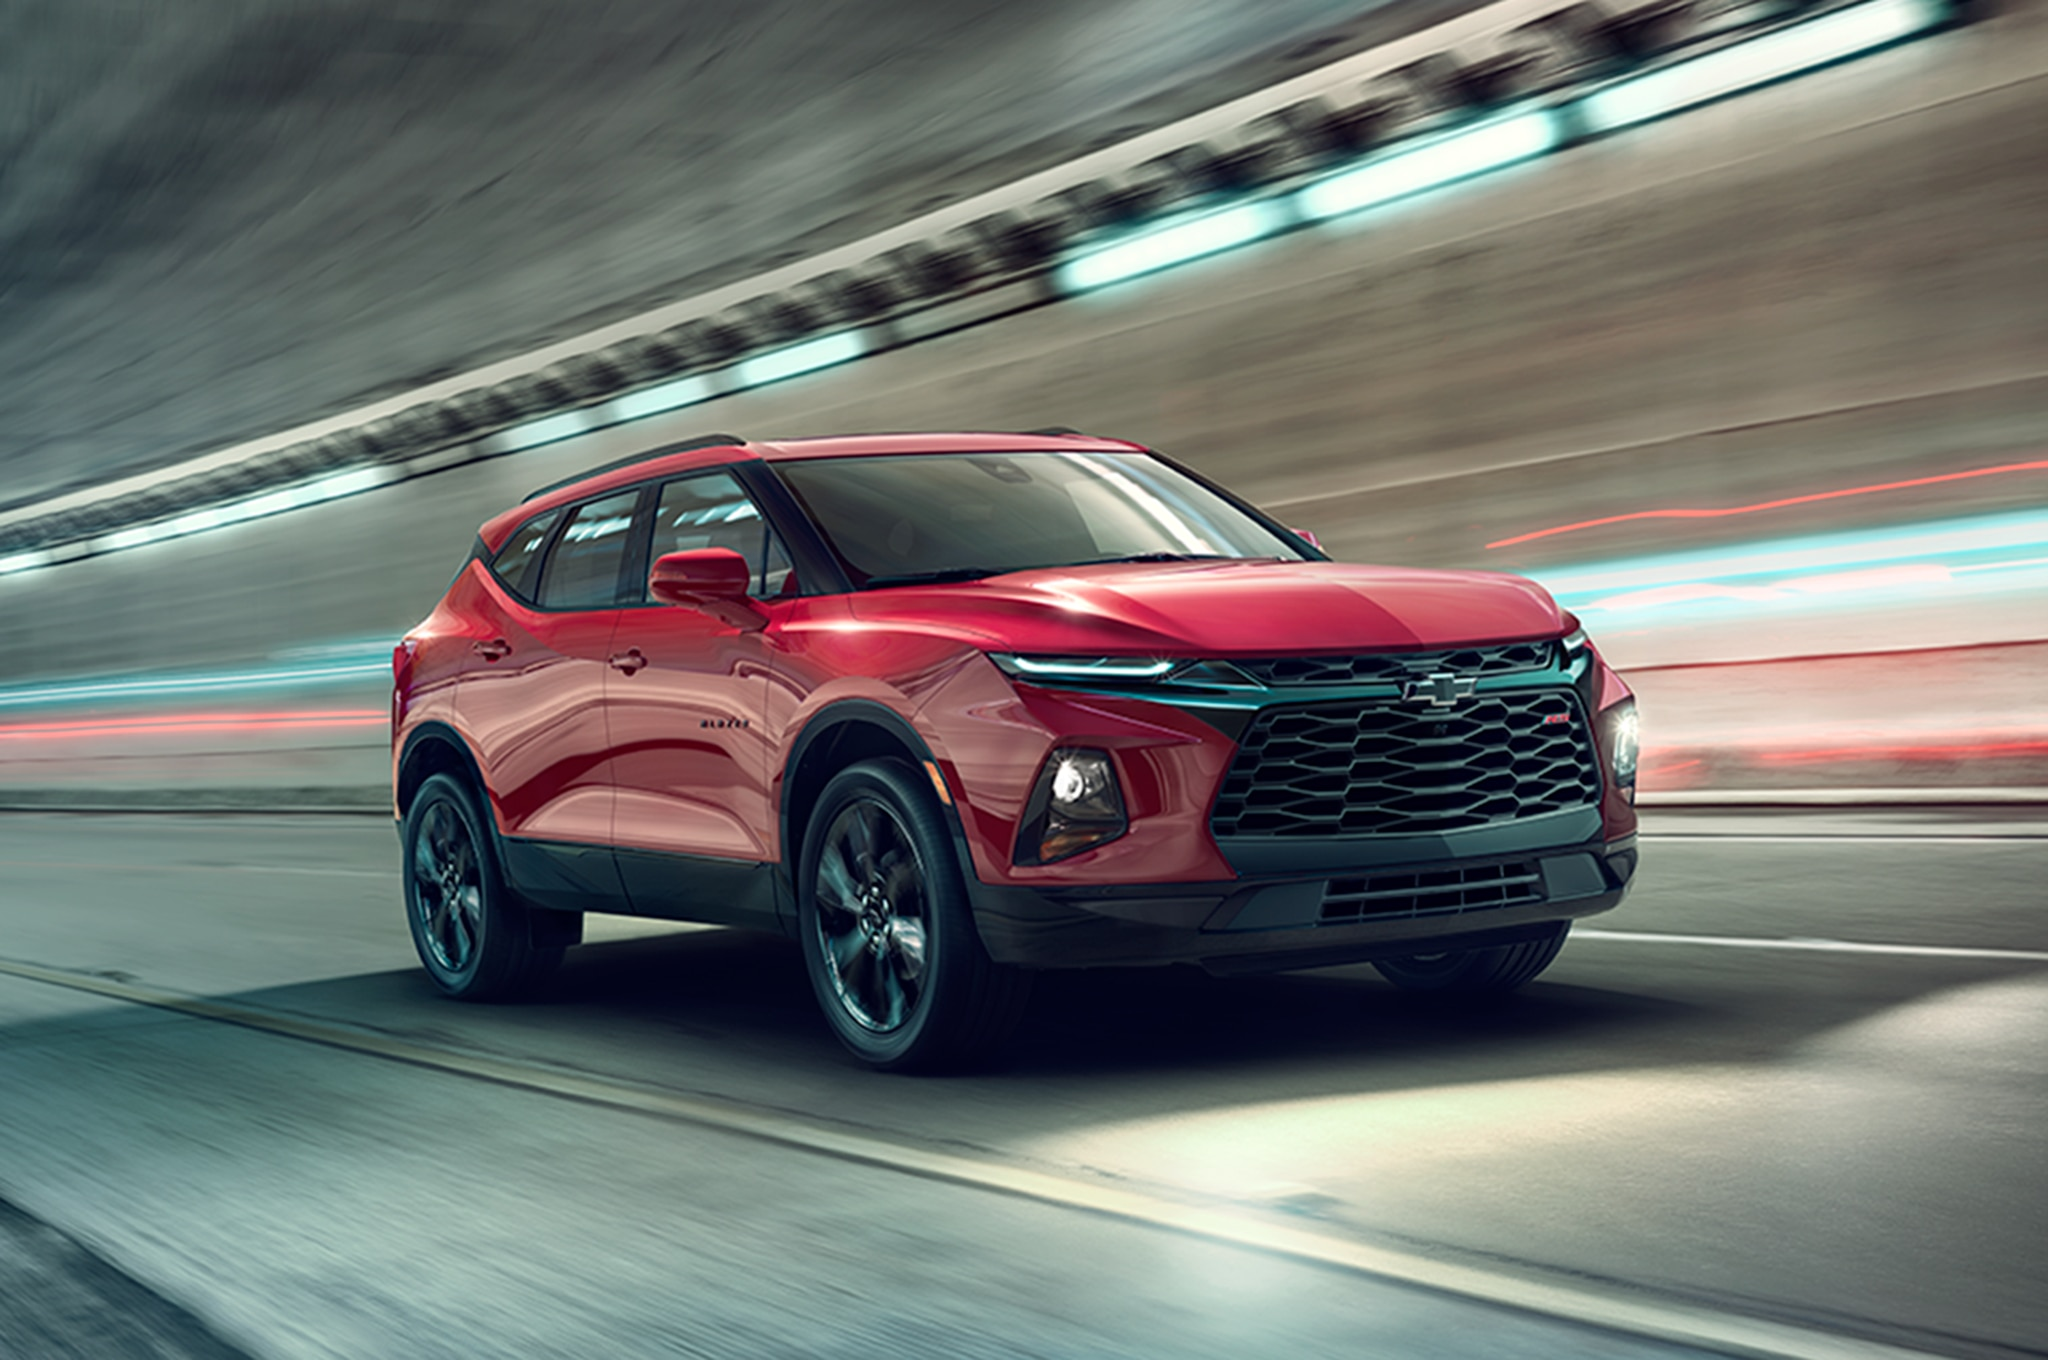 2019 Chevrolet Blazer Front Three Quarter In Motion 03